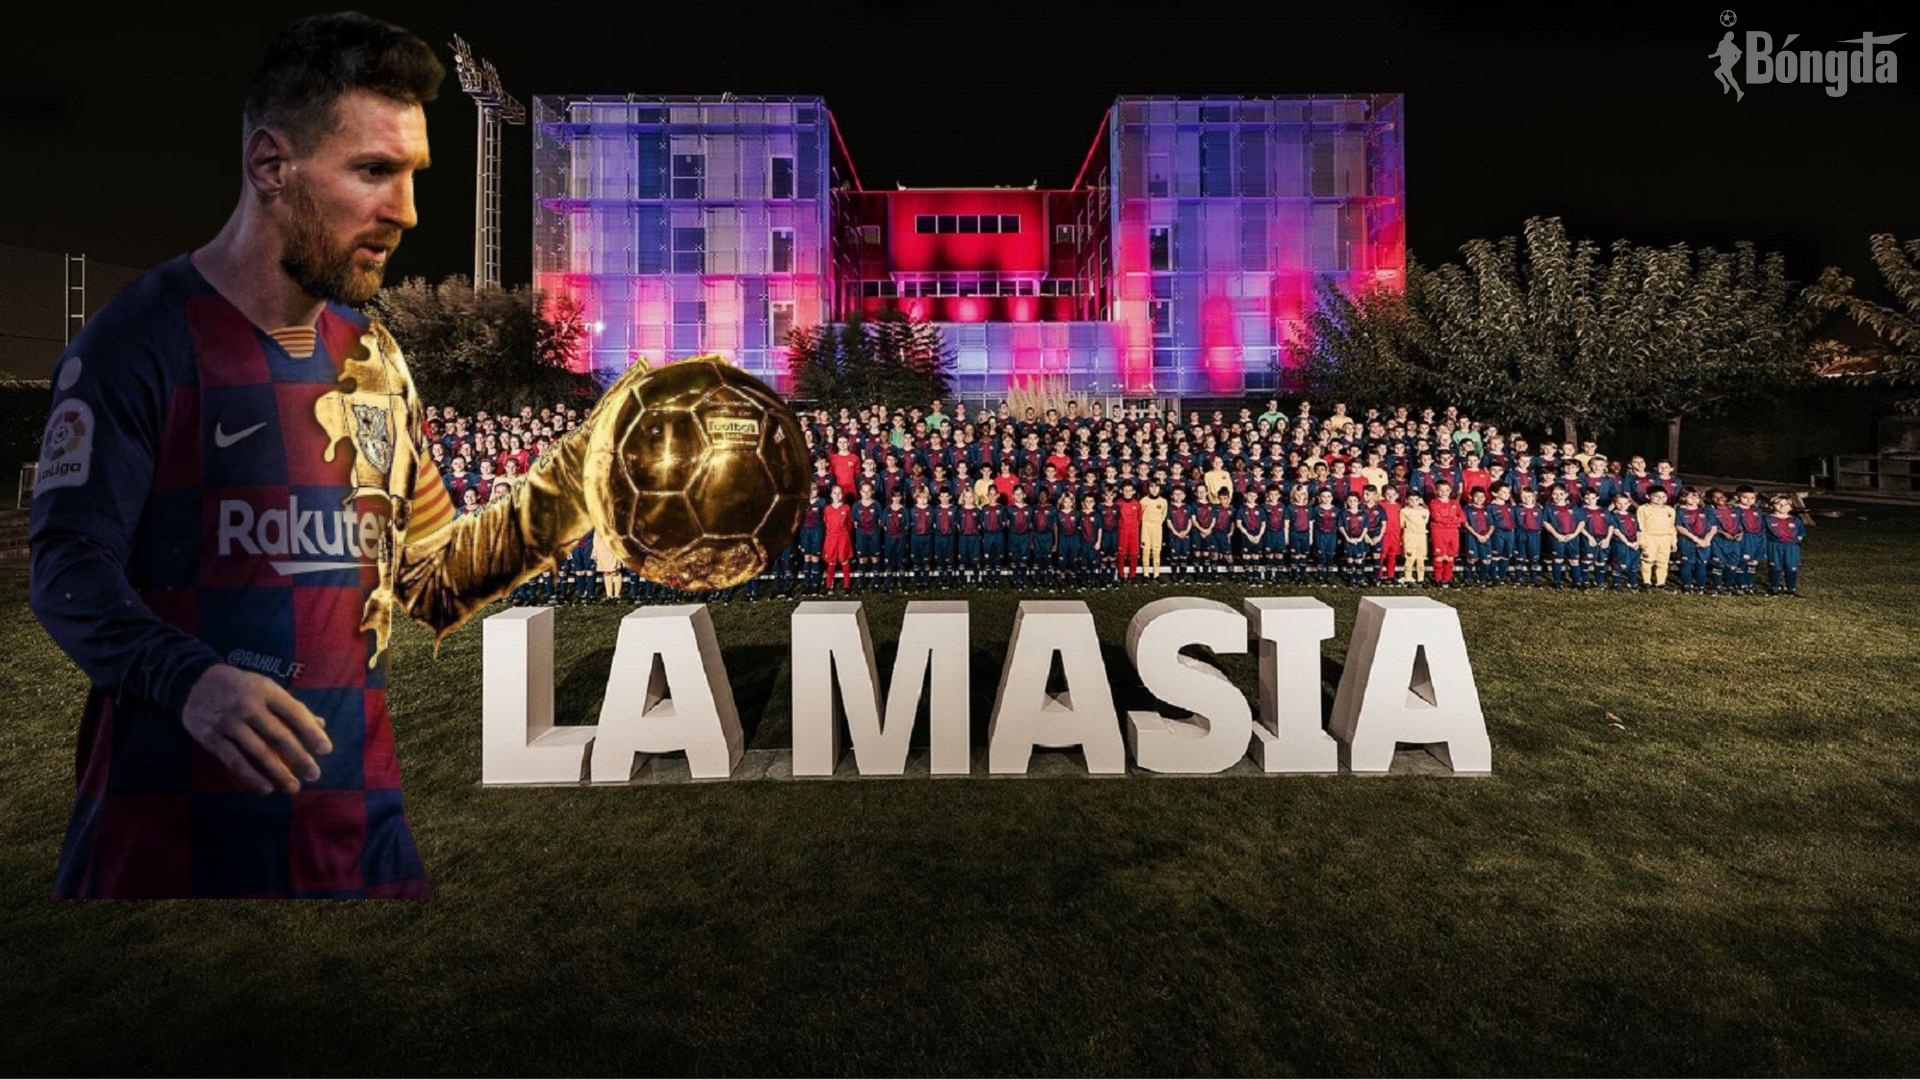 La Masia - nơi sản sinh ra Huyền thoại LIONEL MESSI